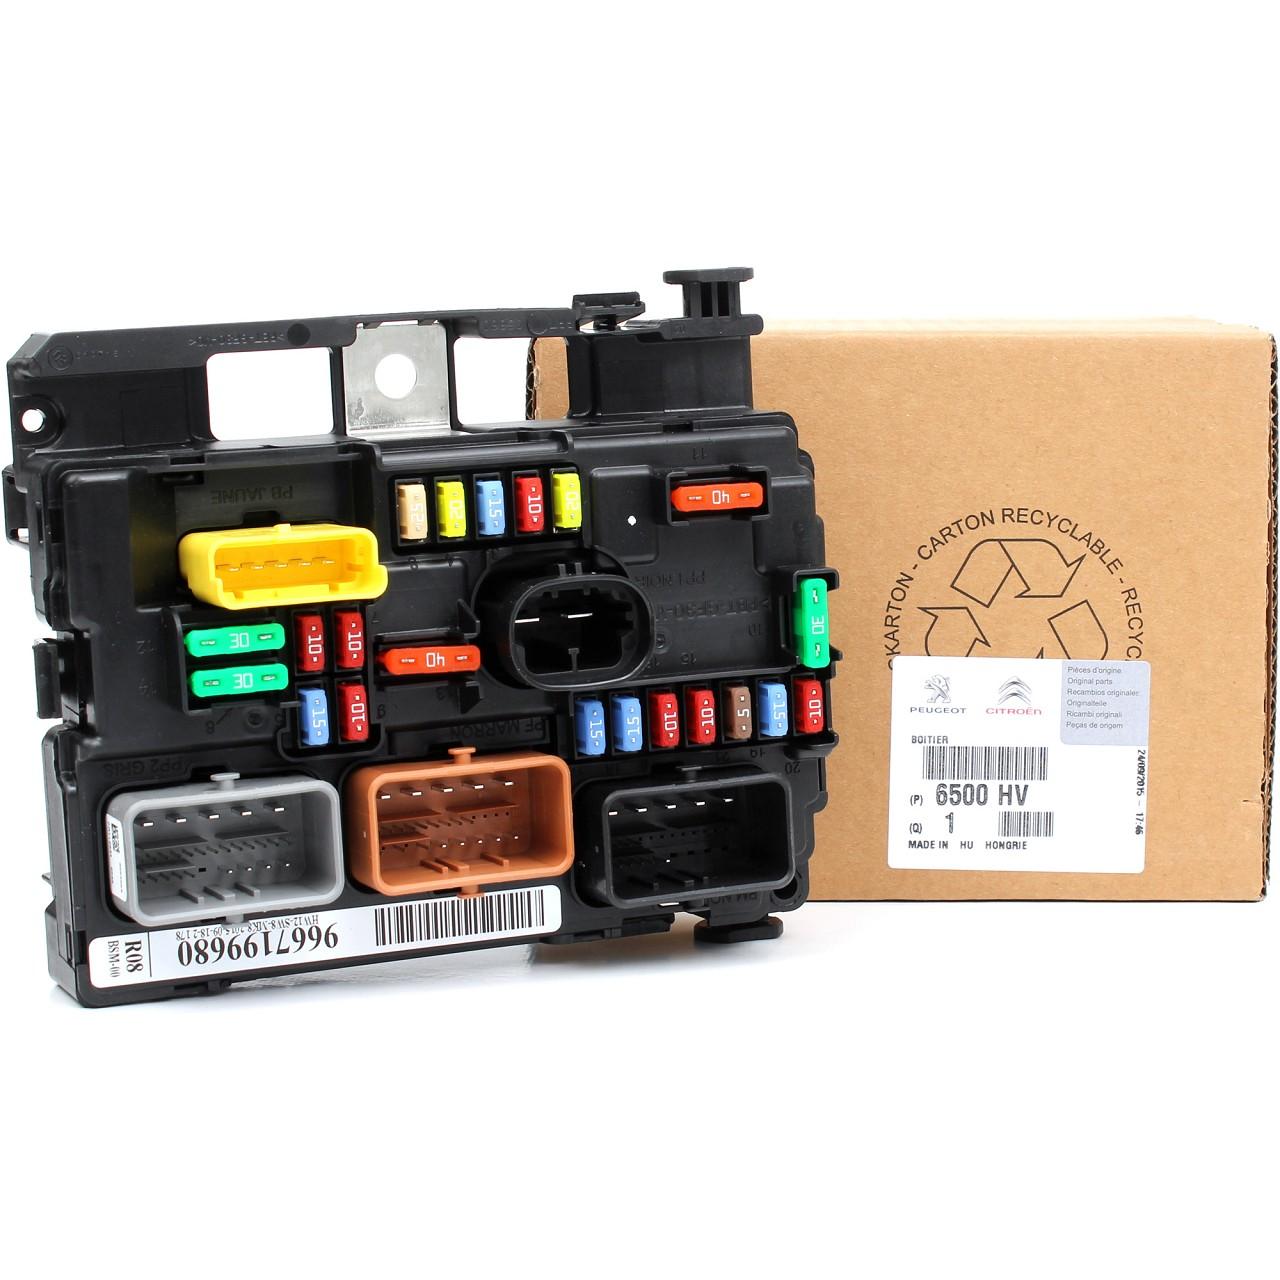 ORIGINAL Peugeot Sicherungskasten Zentralelektronik 1007 207 / CC / SW 6500.HV